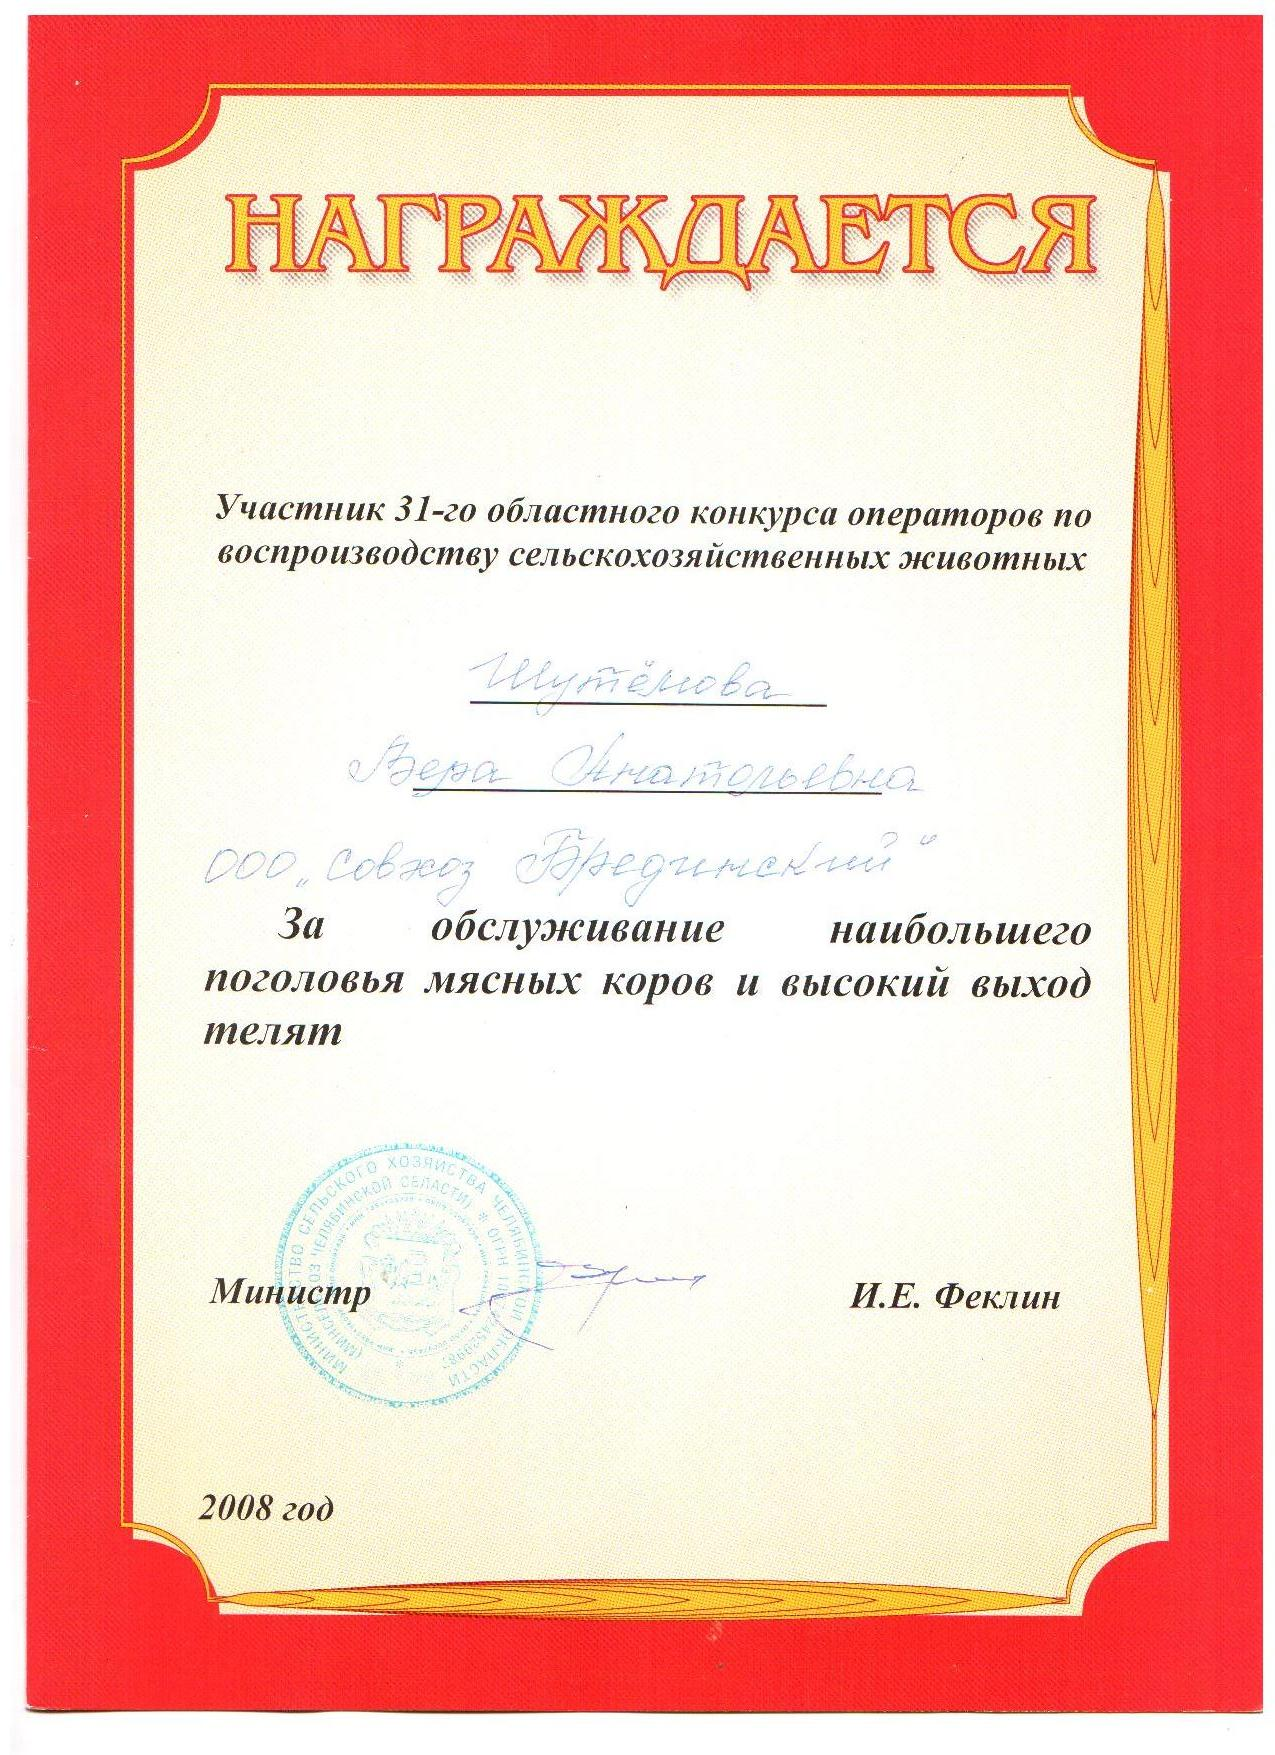 C:\Documents and Settings\Администратор\Рабочий стол\Шутёмова приложение\Изображение 004.jpg